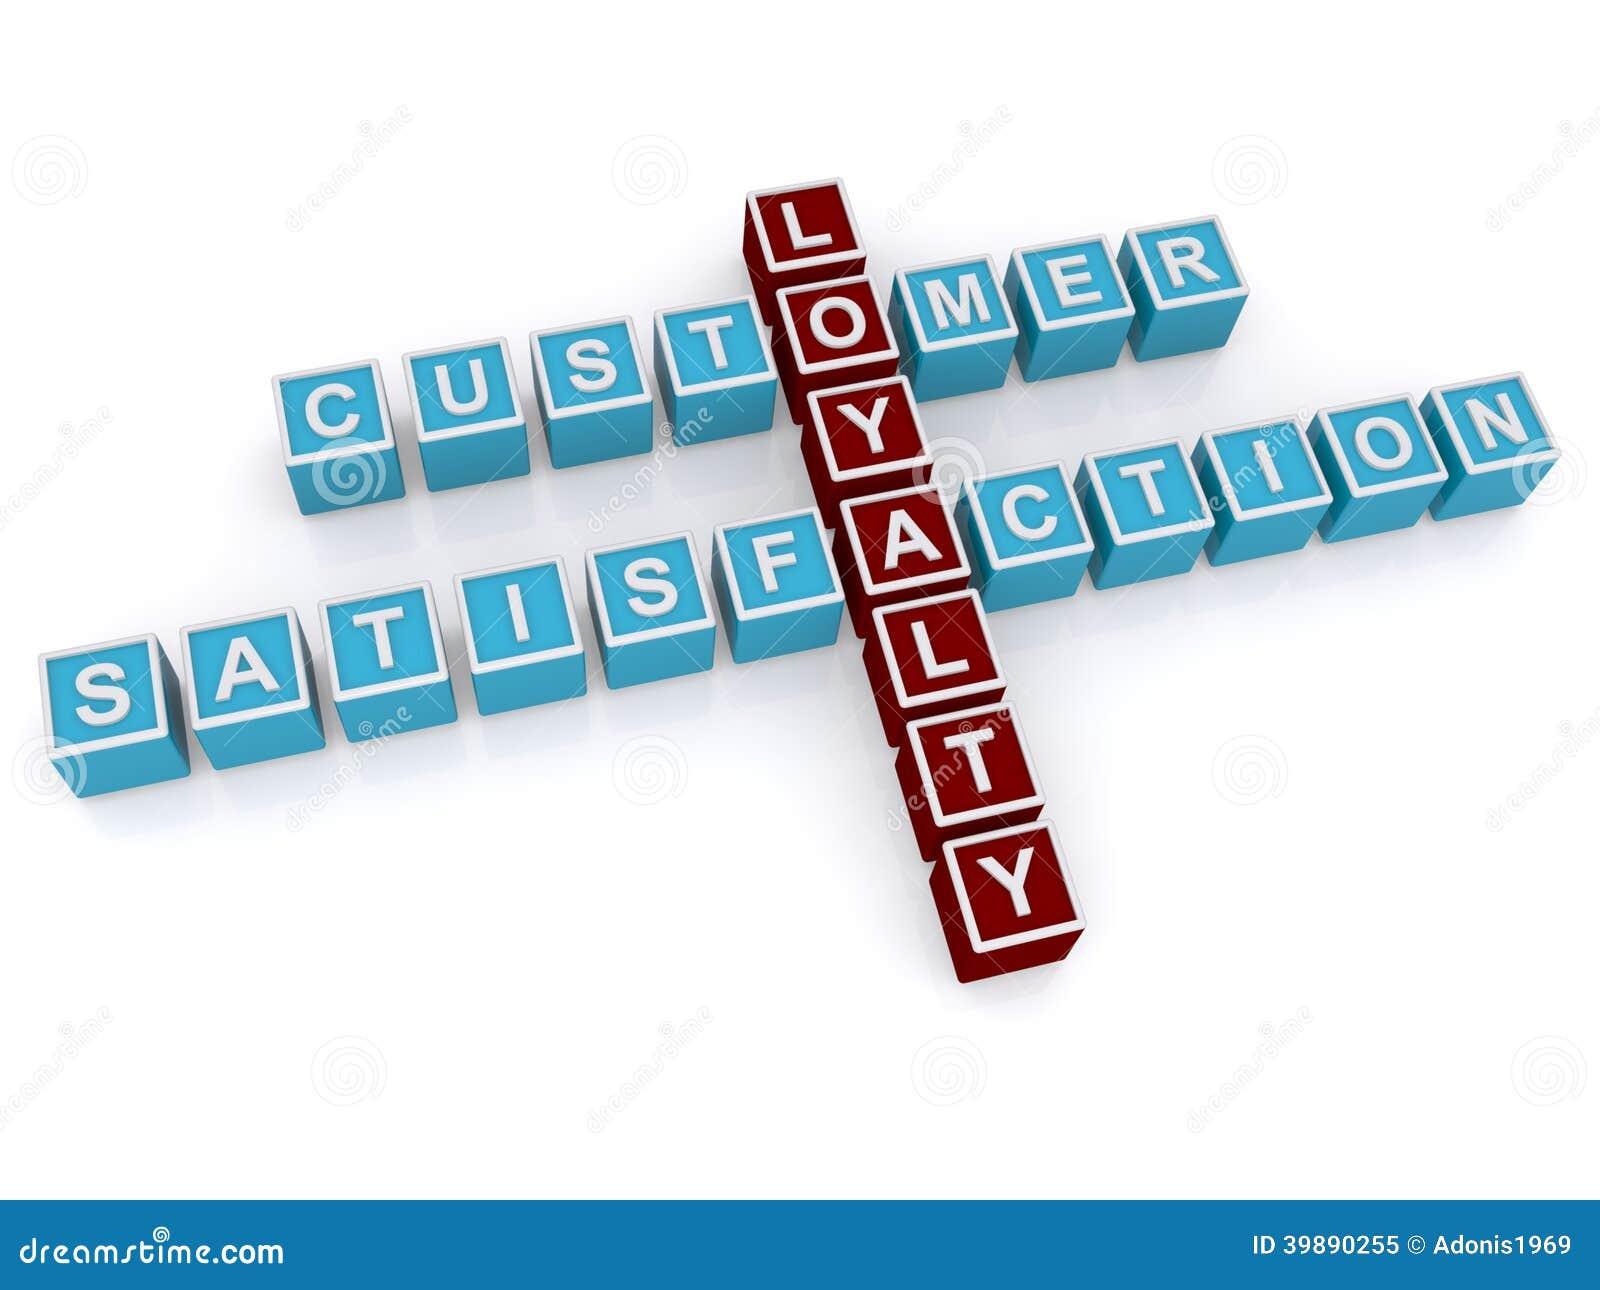 Customer Loyalty And Satisfaction Stock Illustration